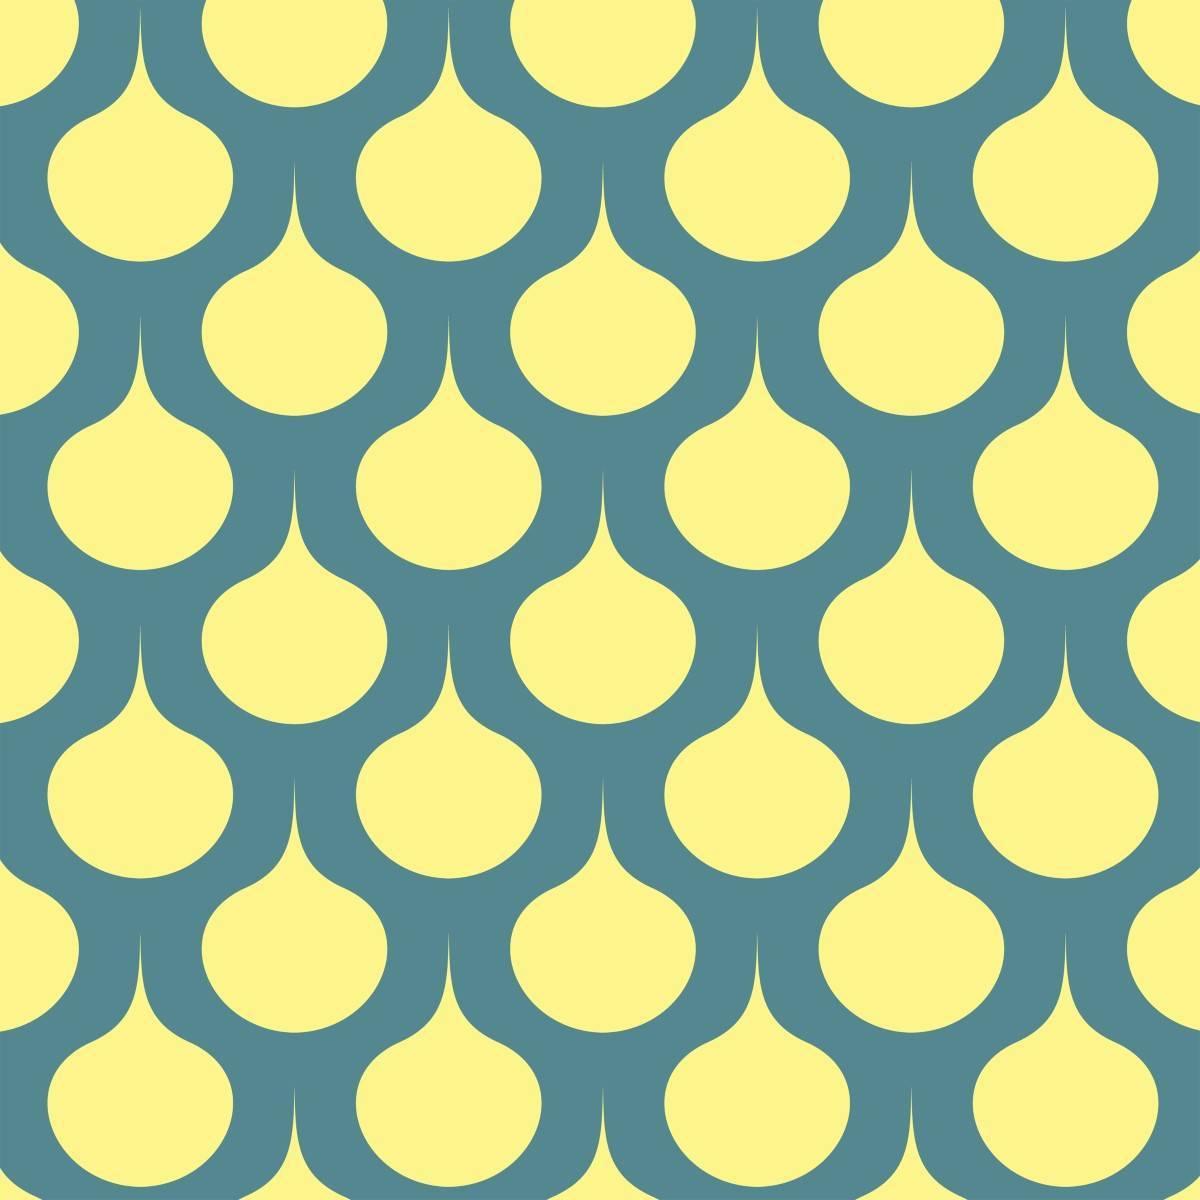 Papel de Parede Amarelo Retrô | Adesivo Vinilico imagem 2